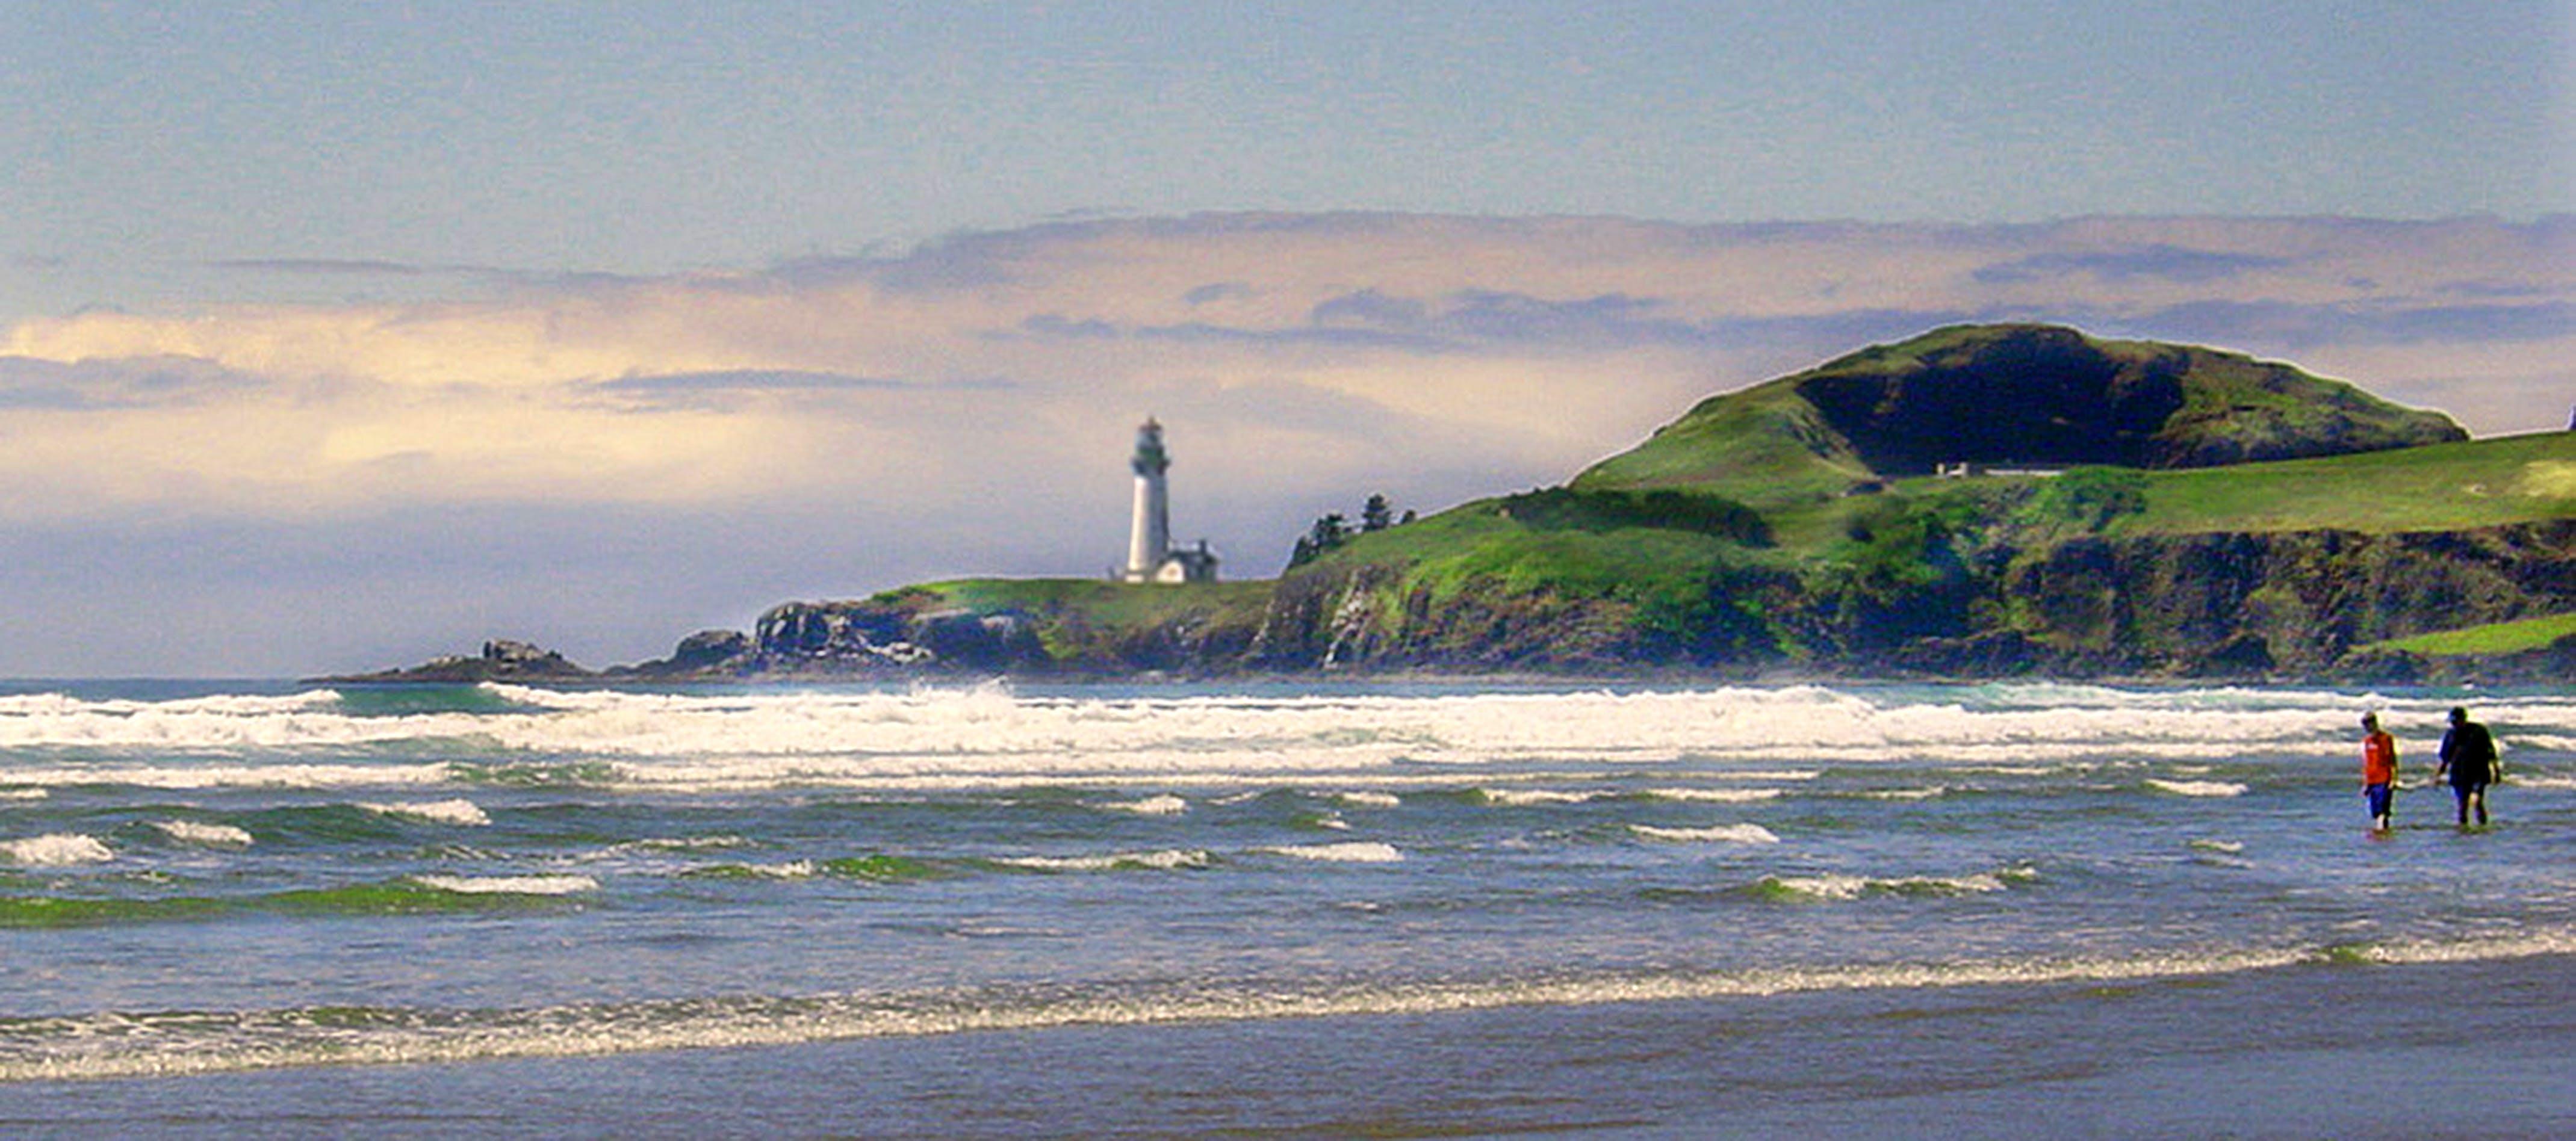 Free stock photo of travel beach lighthouse